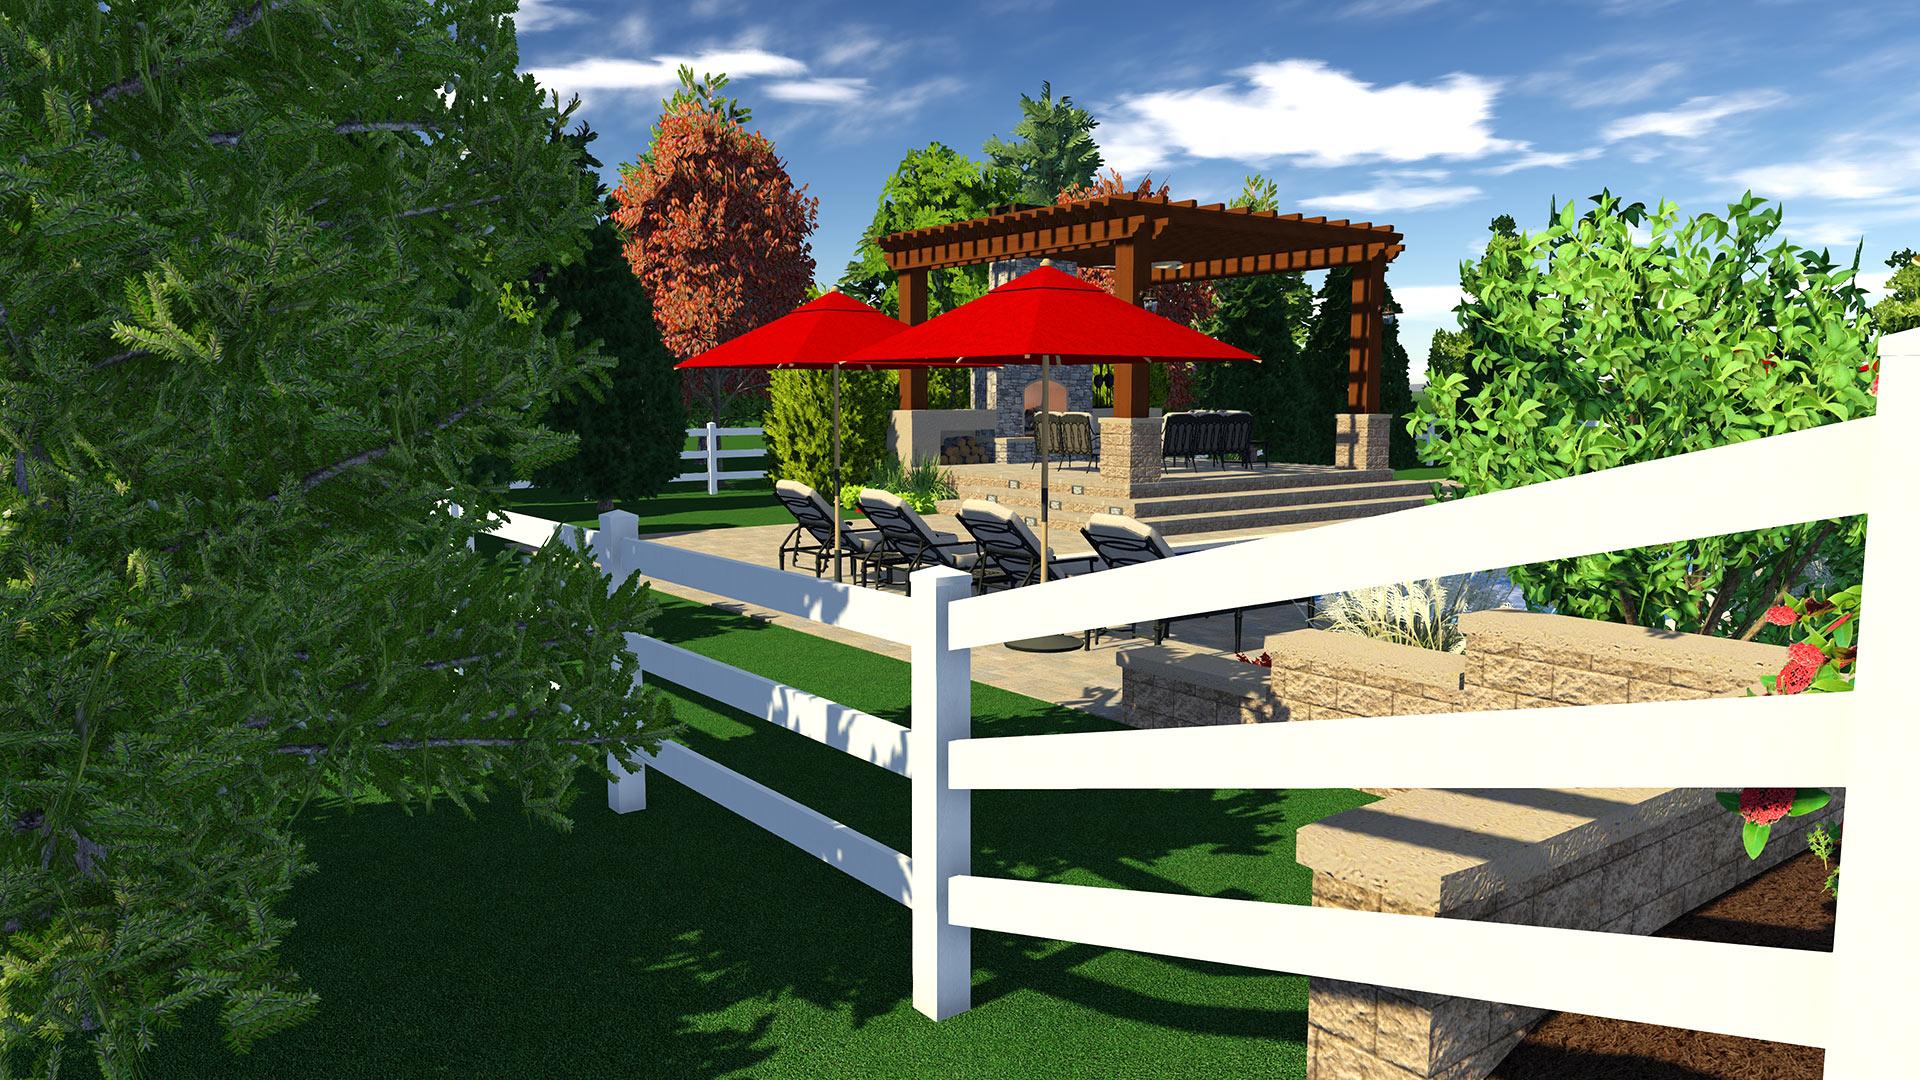 3D Swimming Pool Design Software